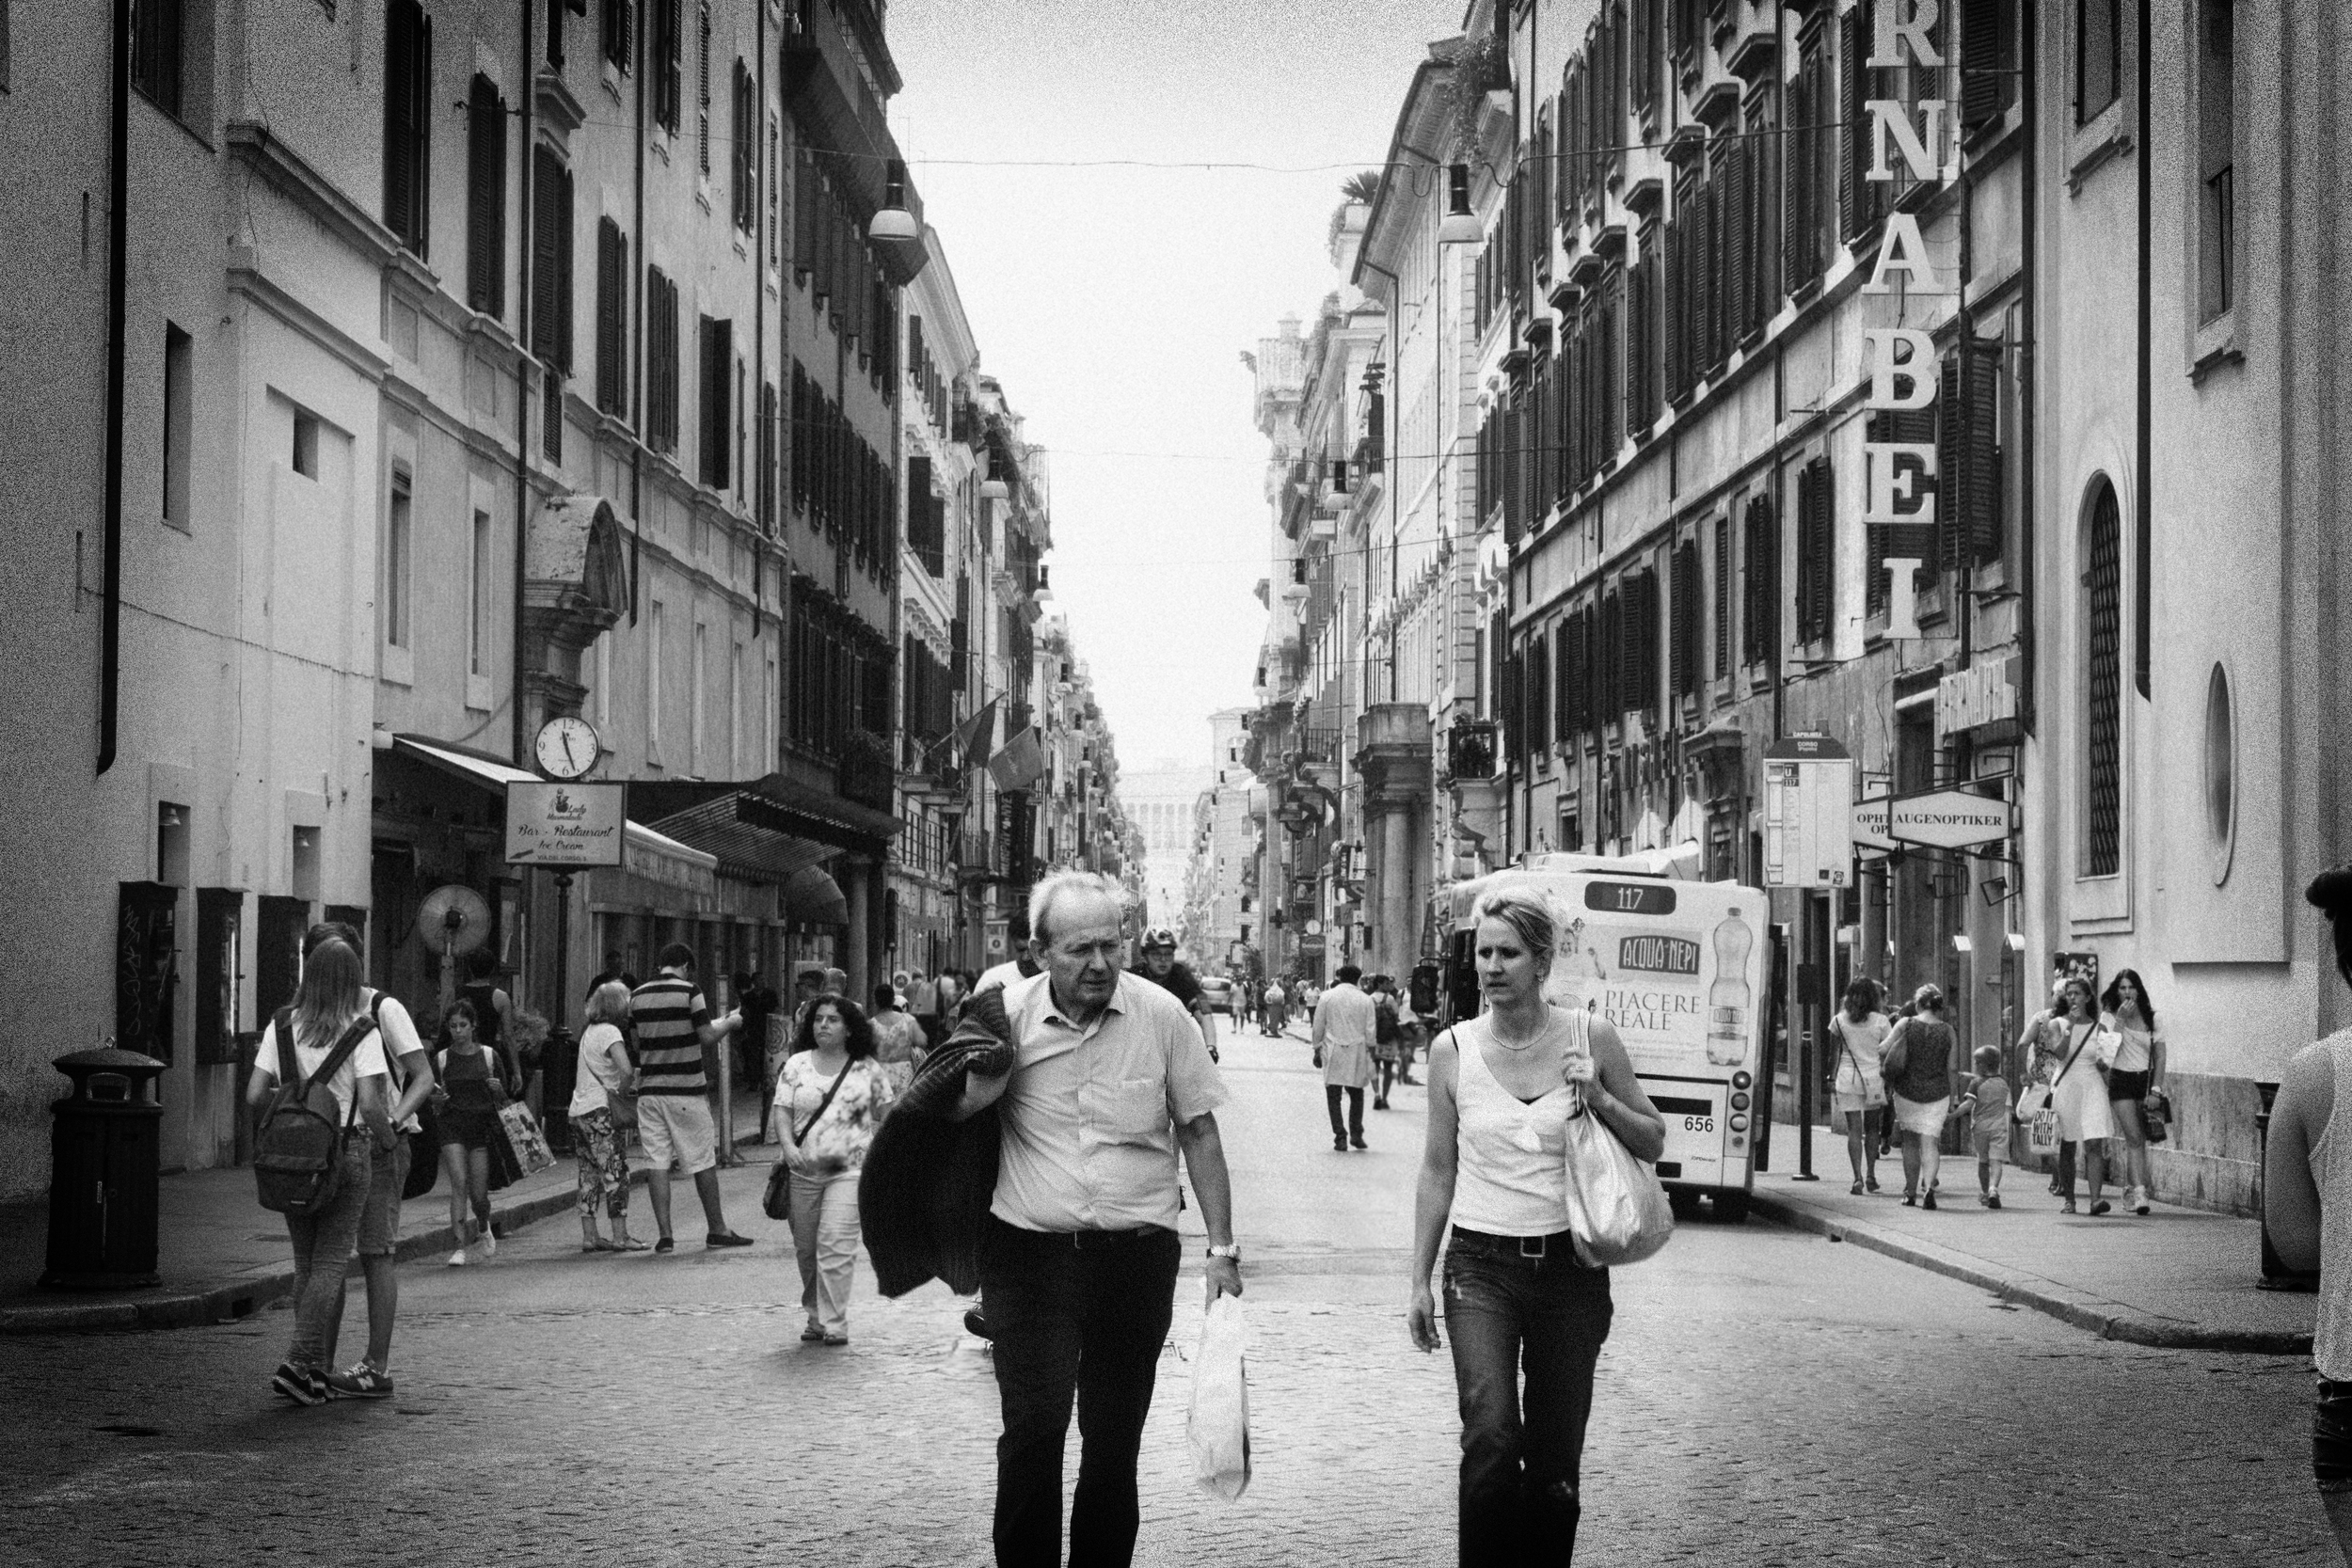 Two people leaving Via del Corso heading toward Piazza de Popolo in the Tridente neighborhood.